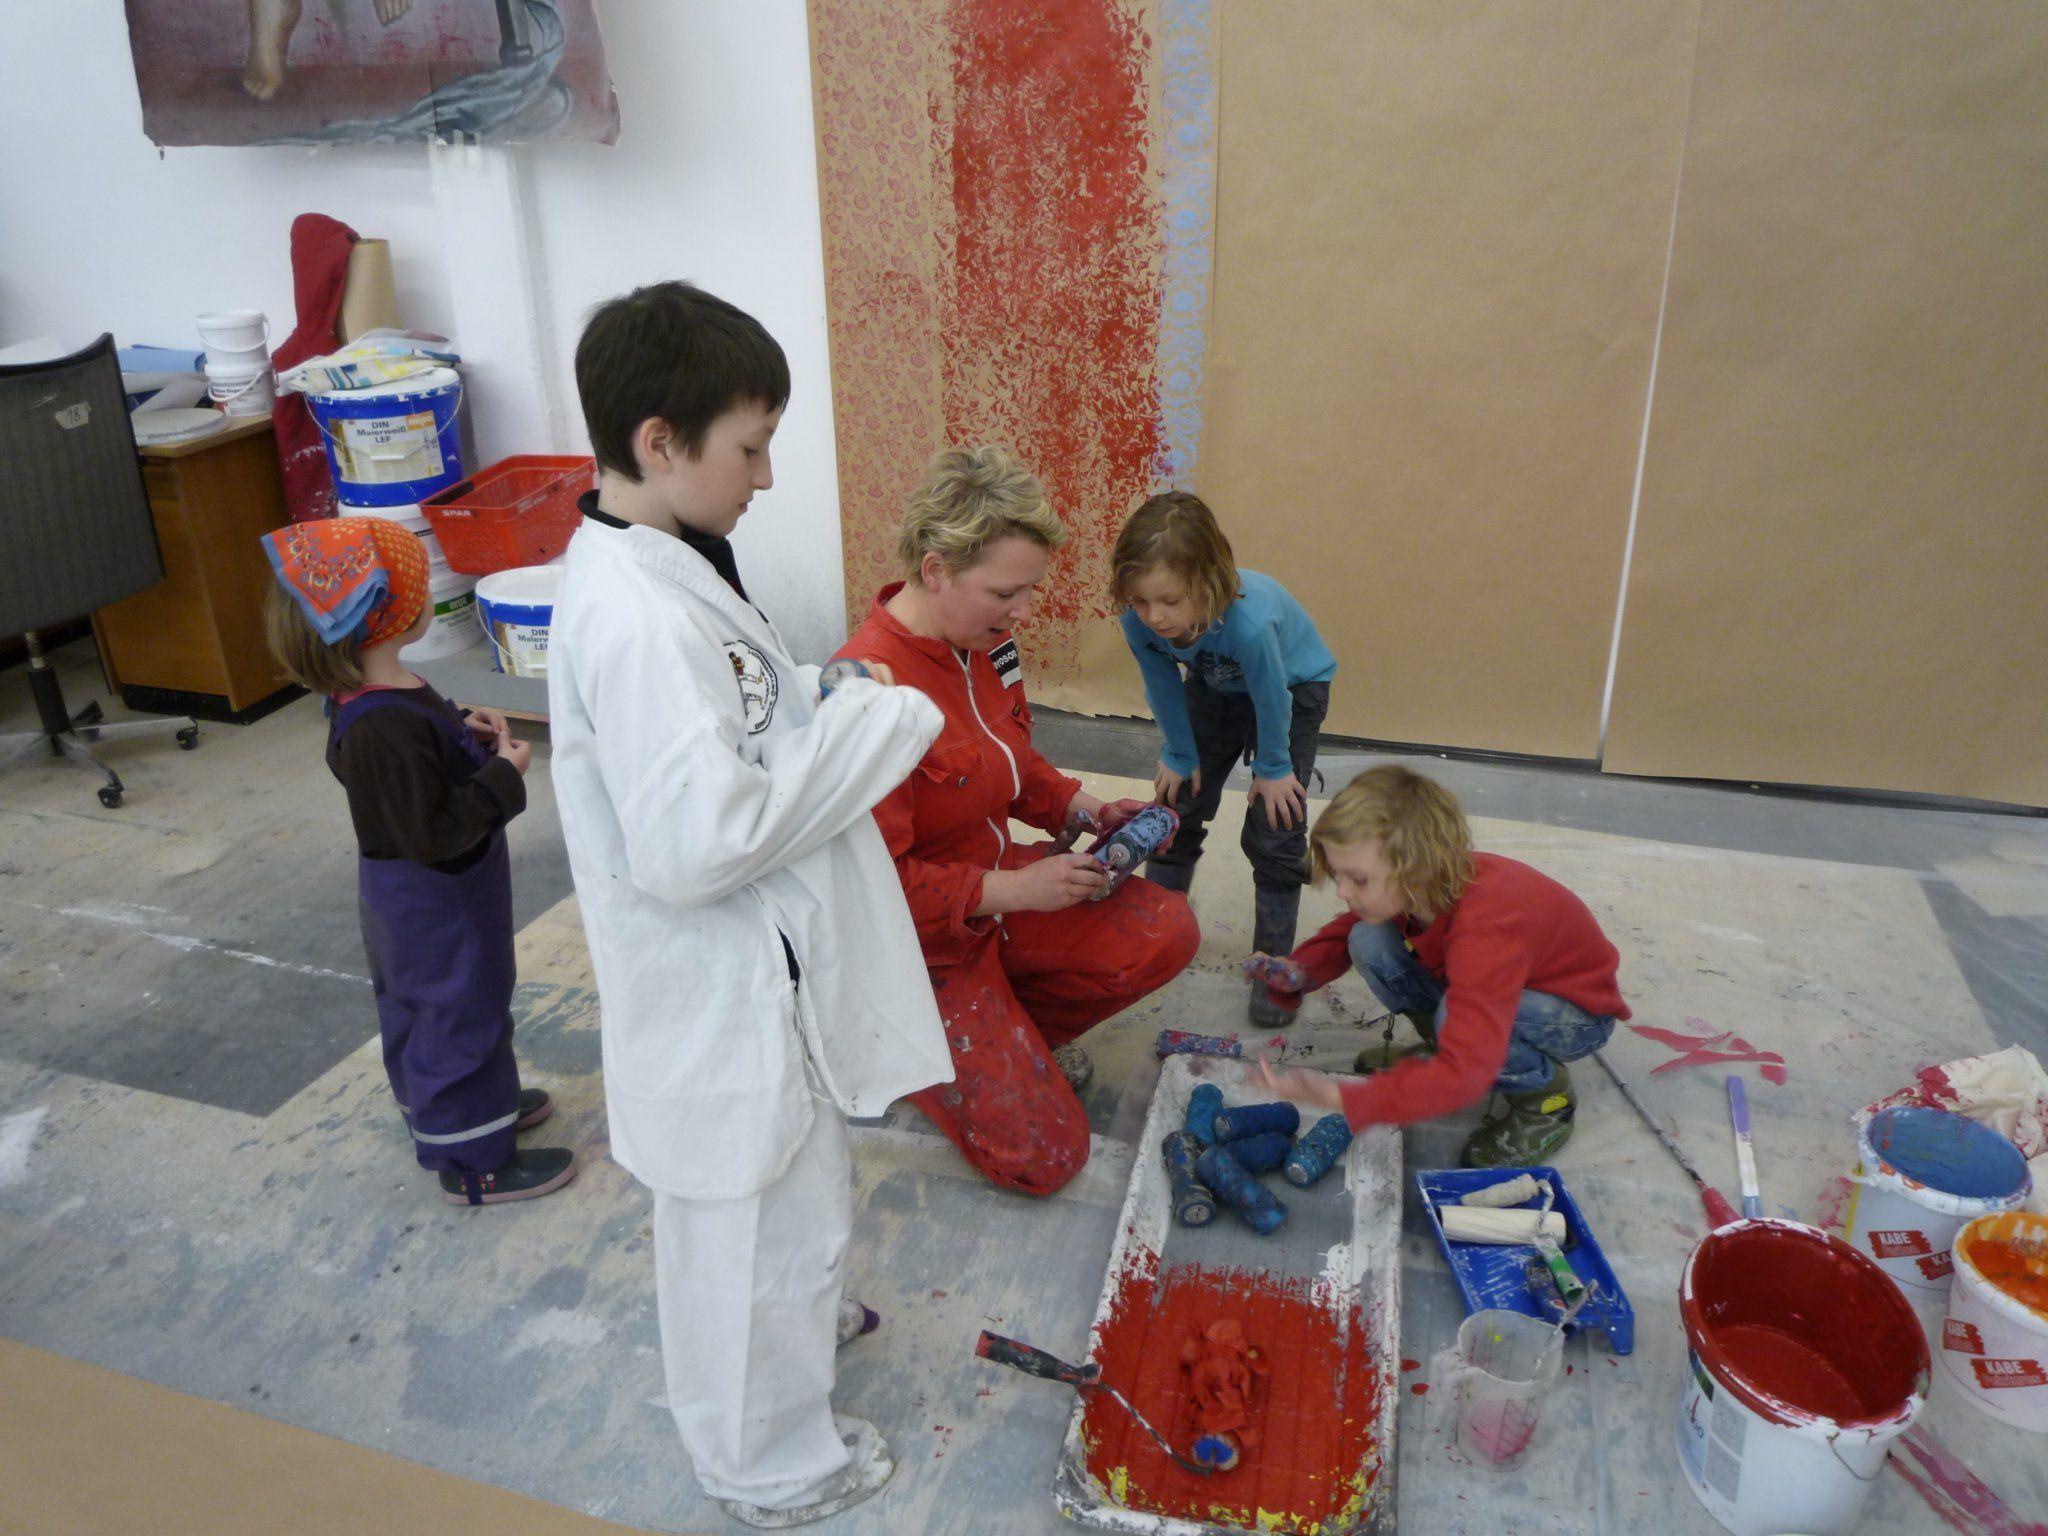 Bühnenmalerei begeisterte Kinder